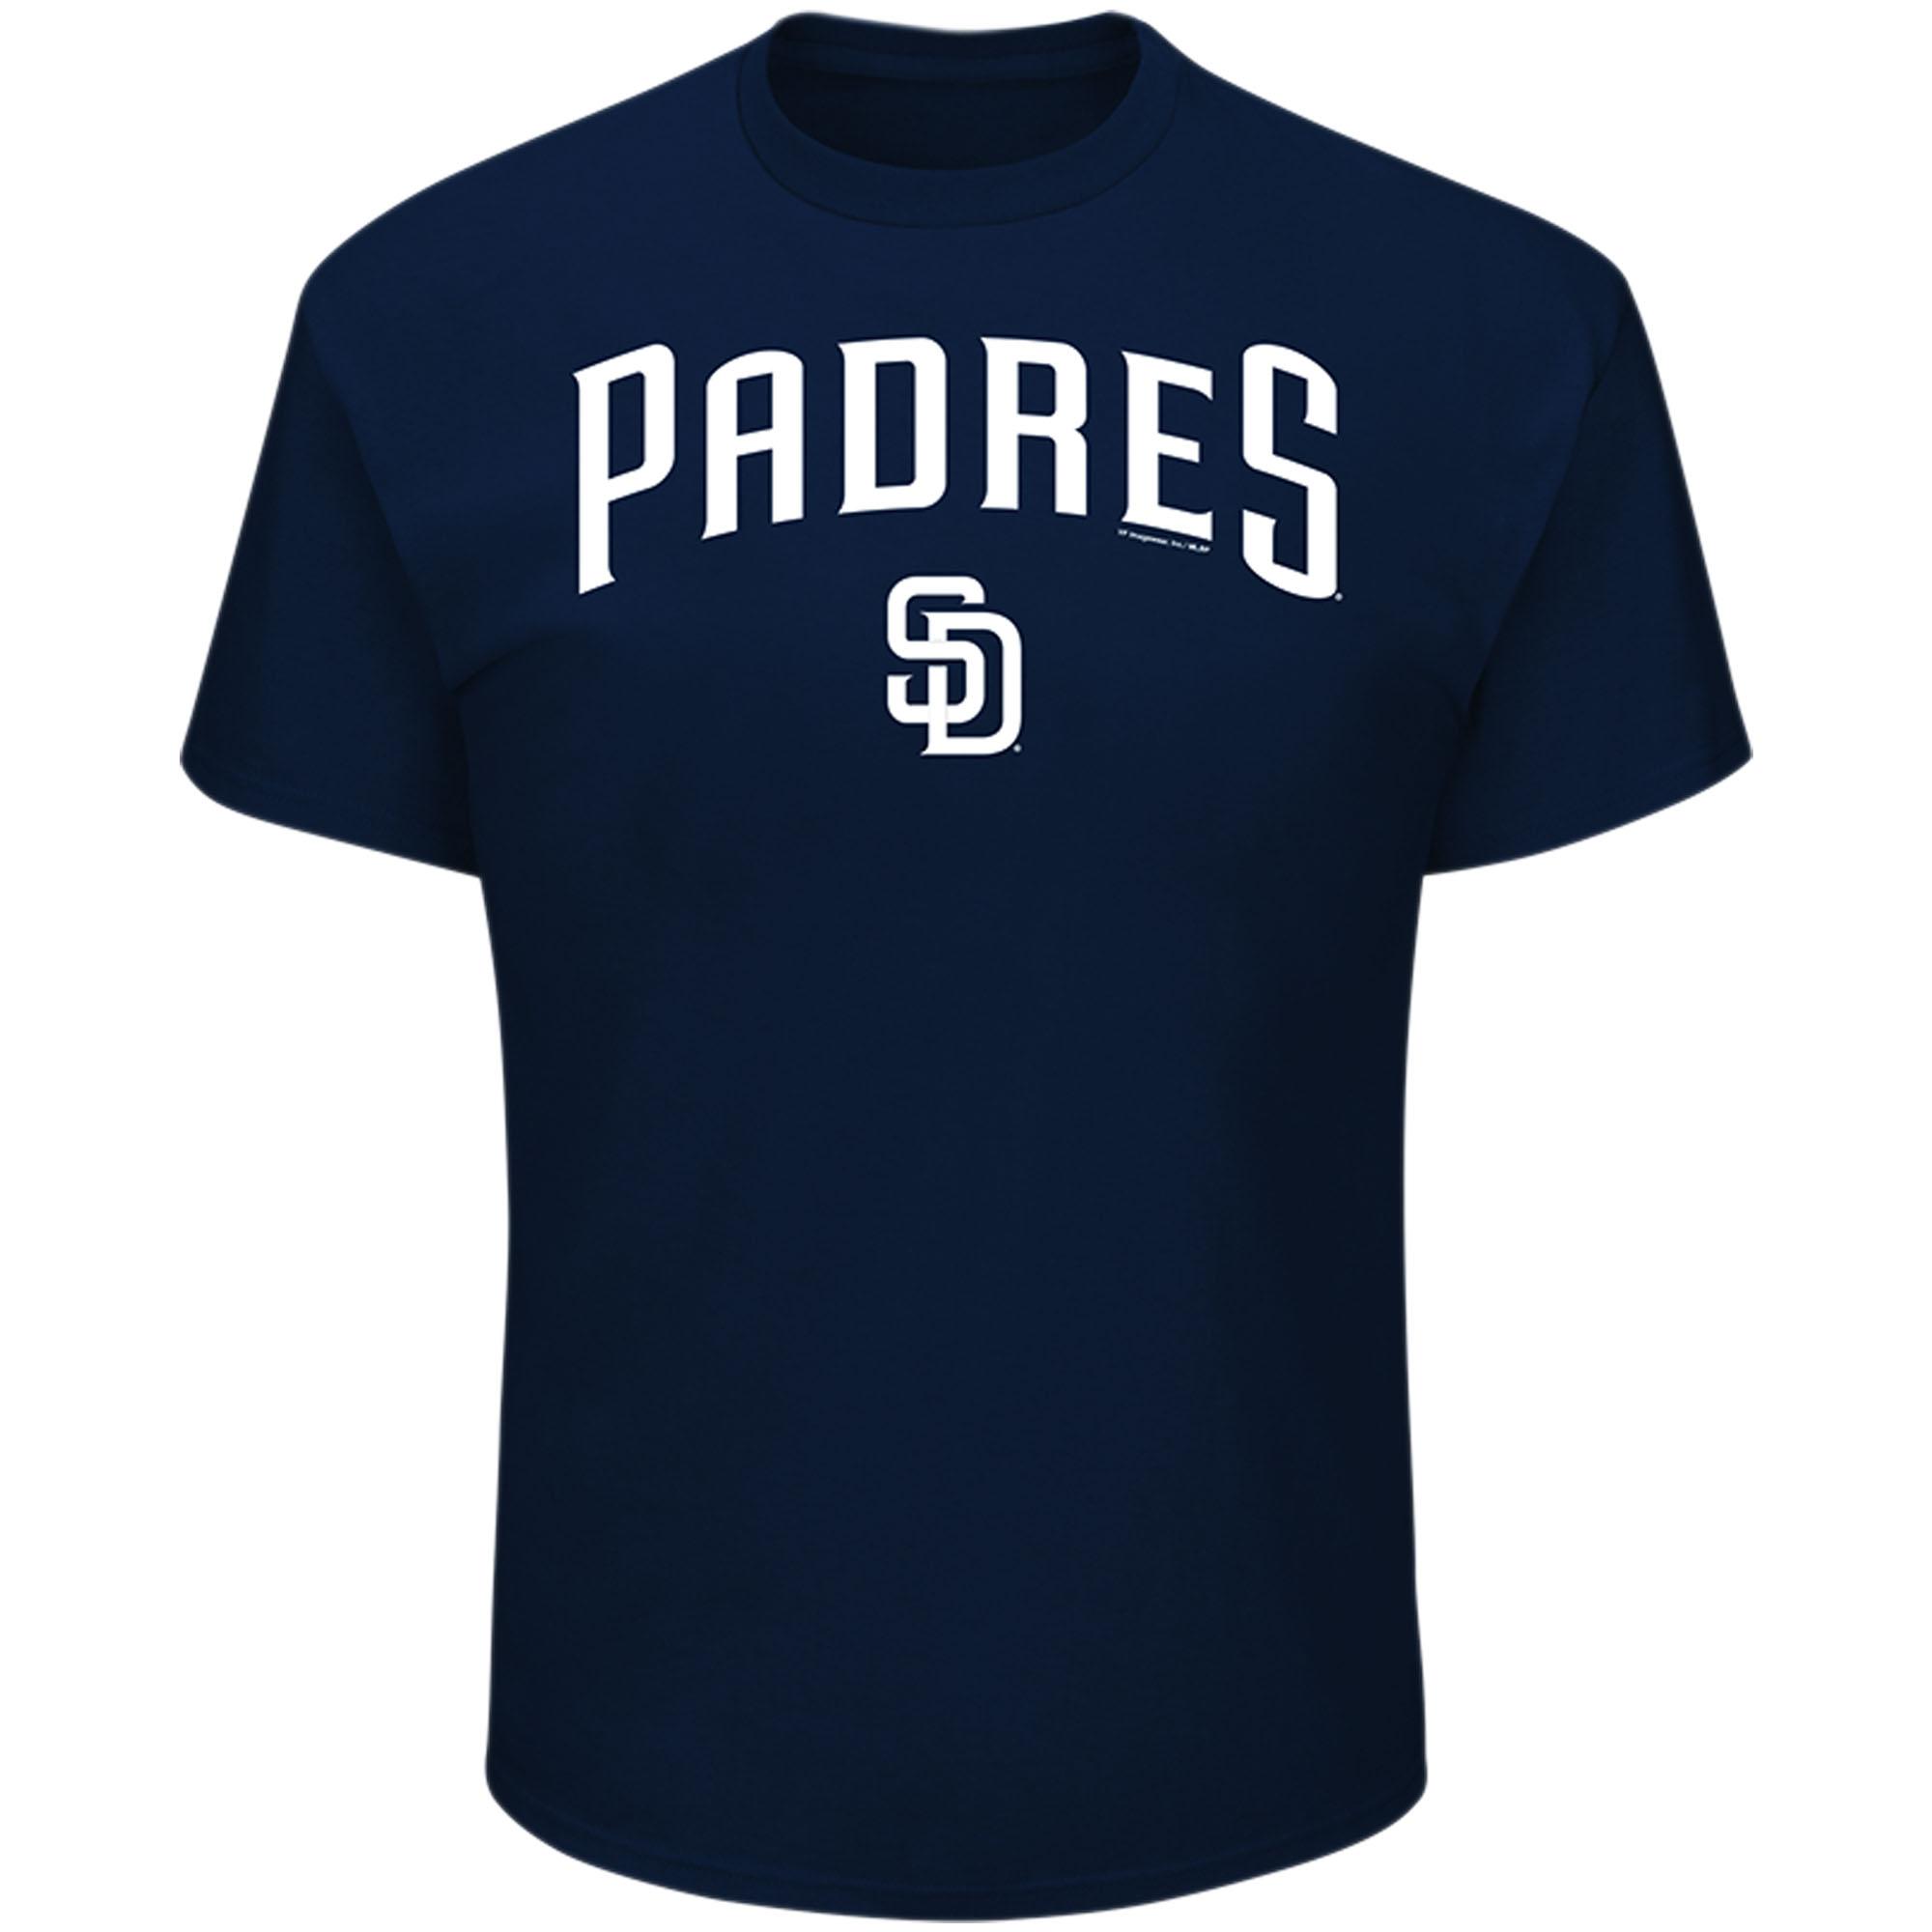 Men's Majestic Navy San Diego Padres Bigger Series Sweep T-Shirt